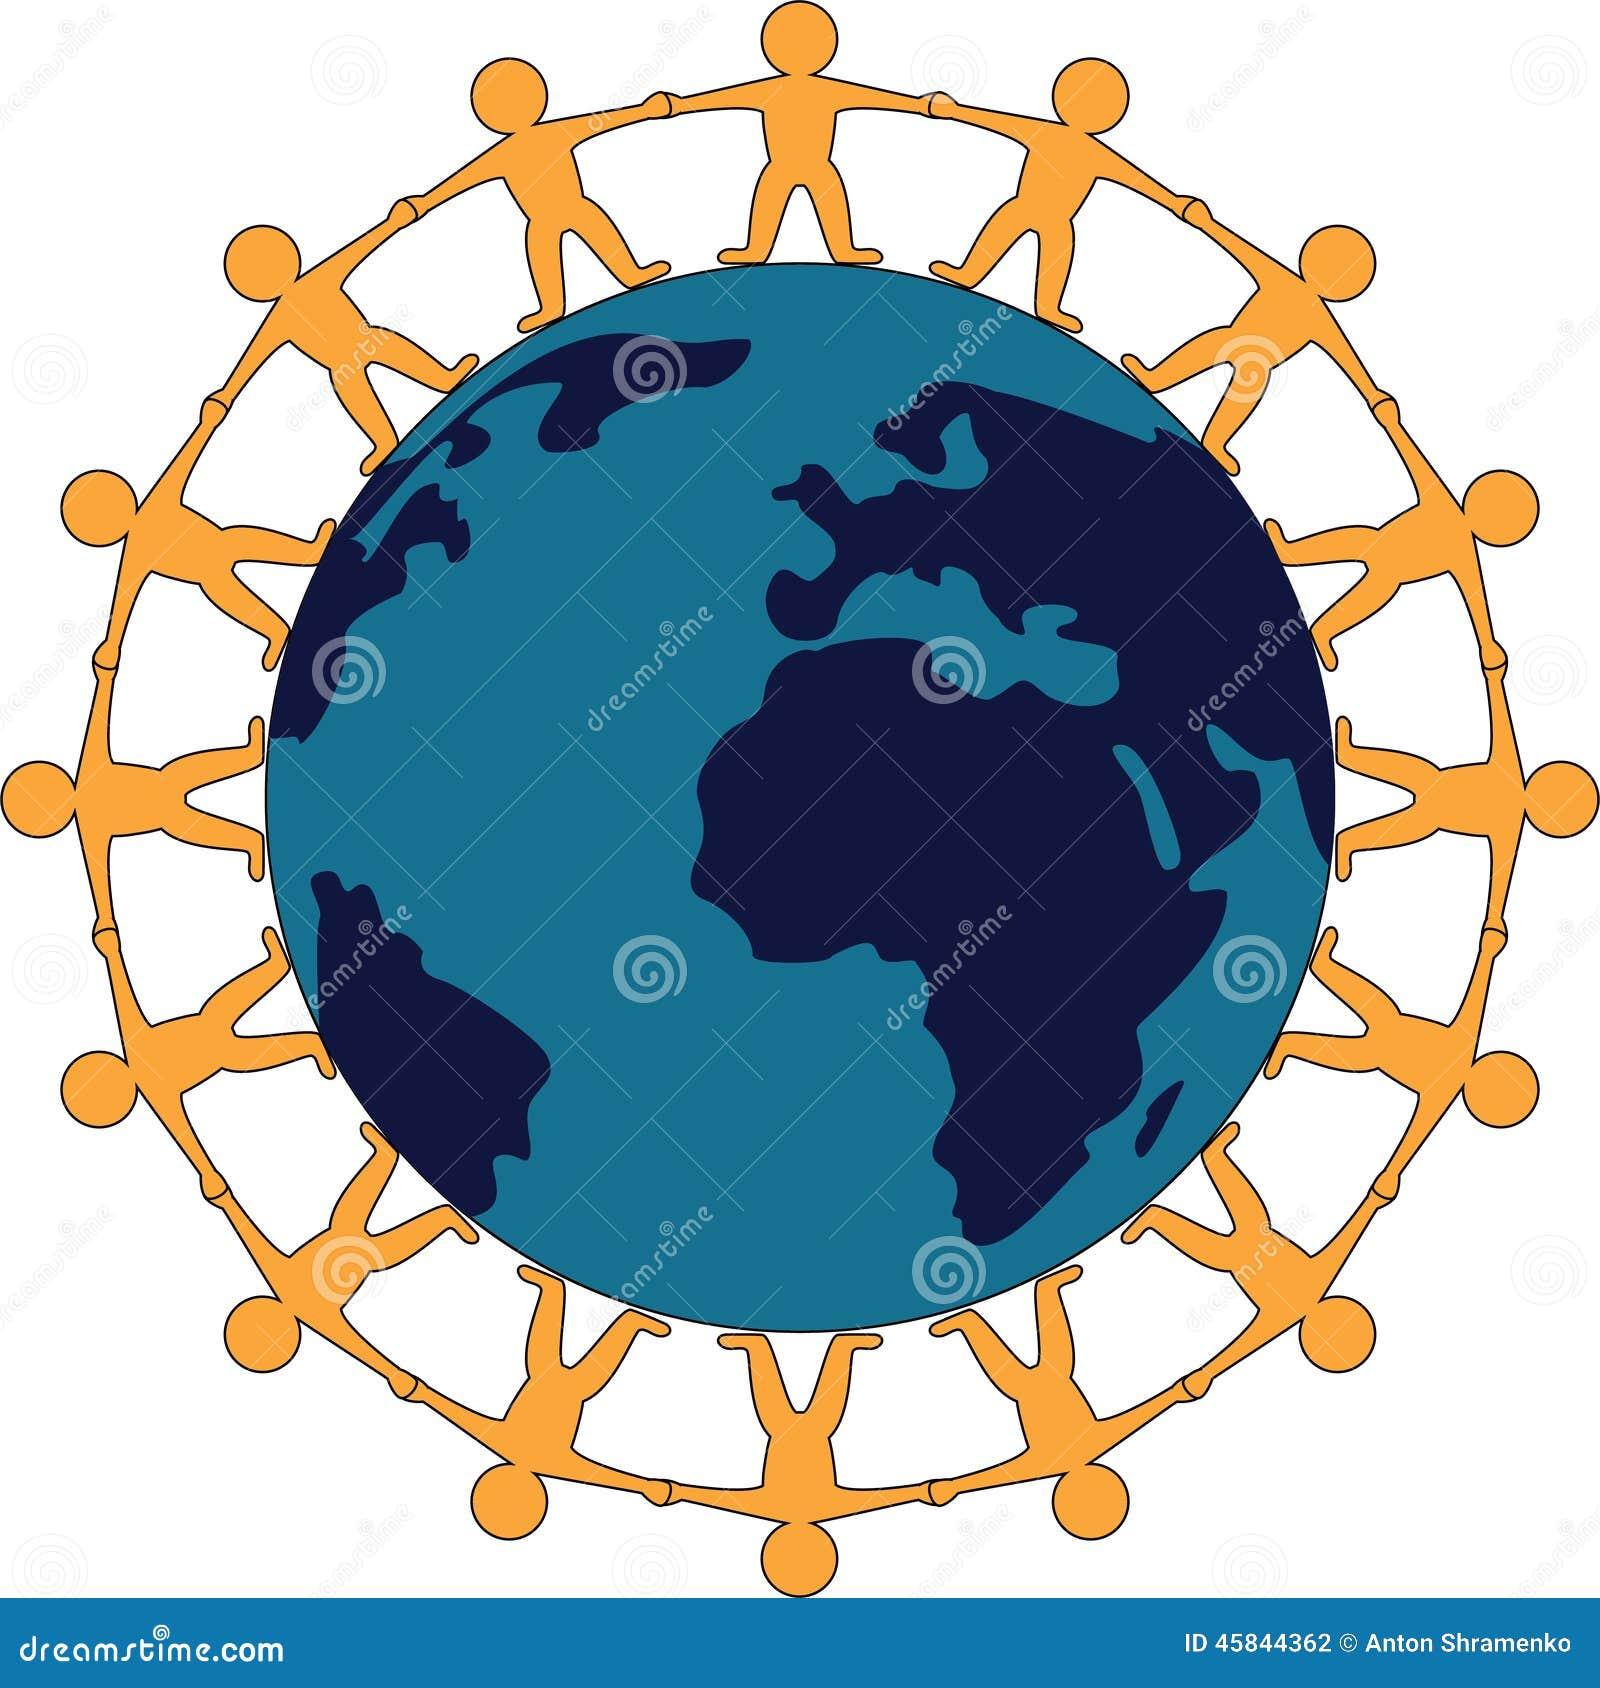 Friendship Around The World Symbol Stock Vector Illustration Of